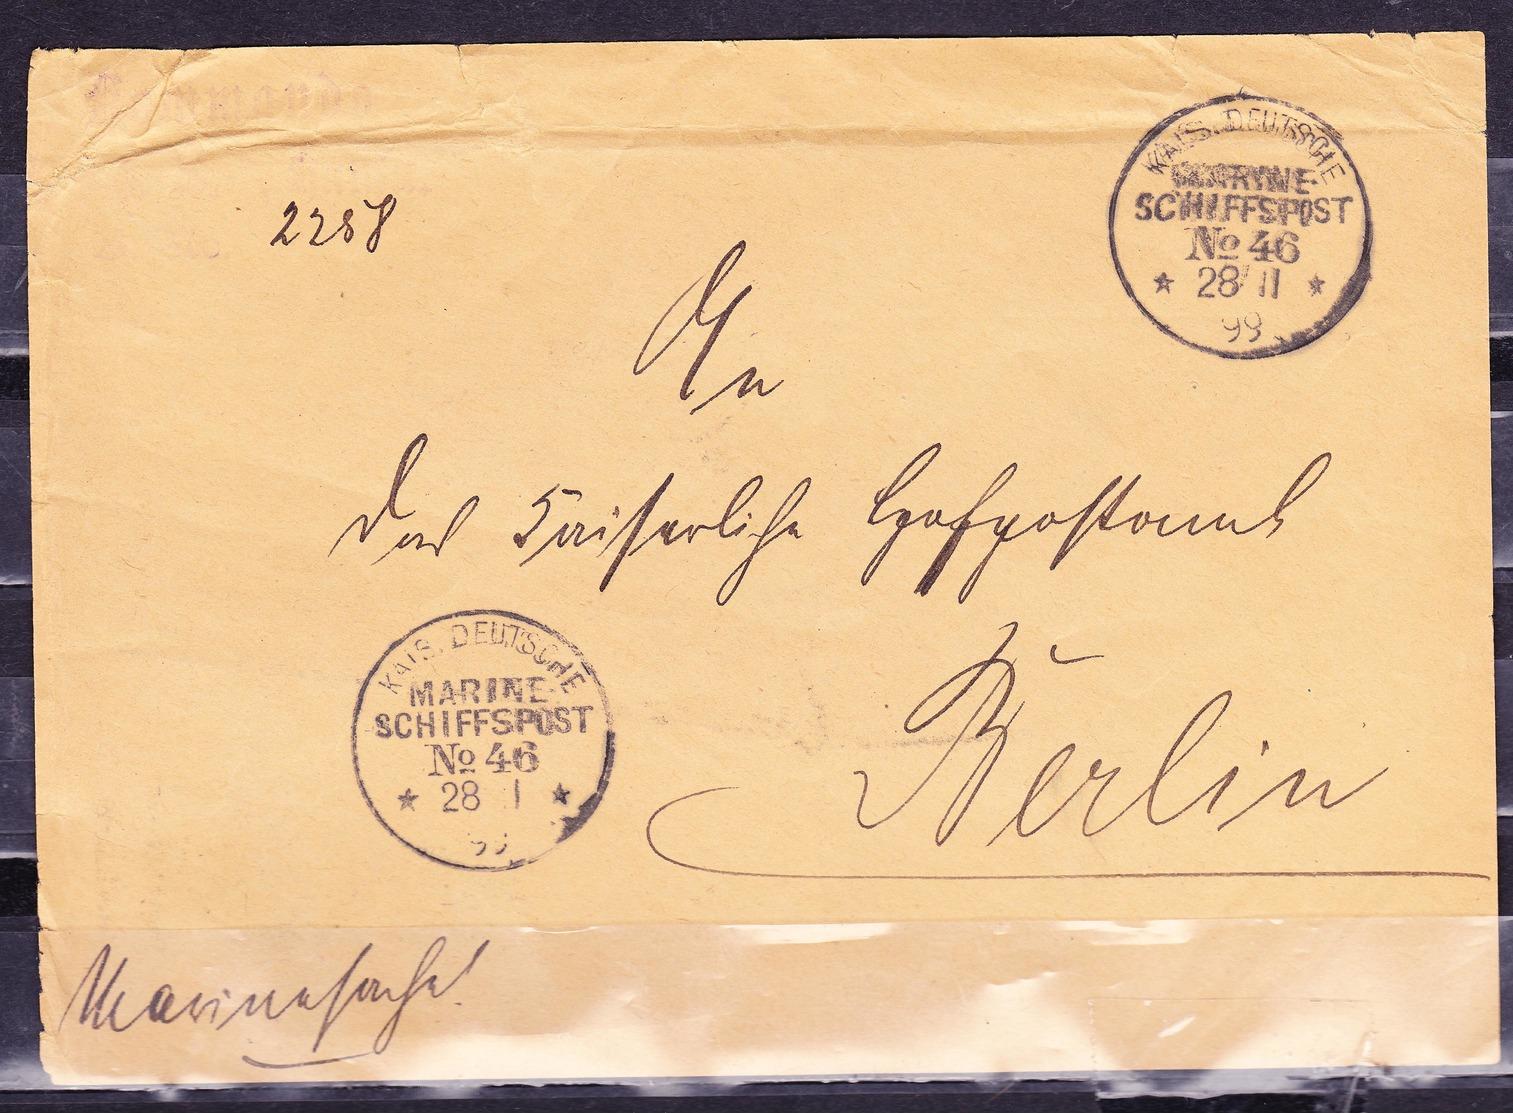 GERMANY 1899 MARINE SCHIFFSPOST COVER TO BERLIN - Briefe U. Dokumente